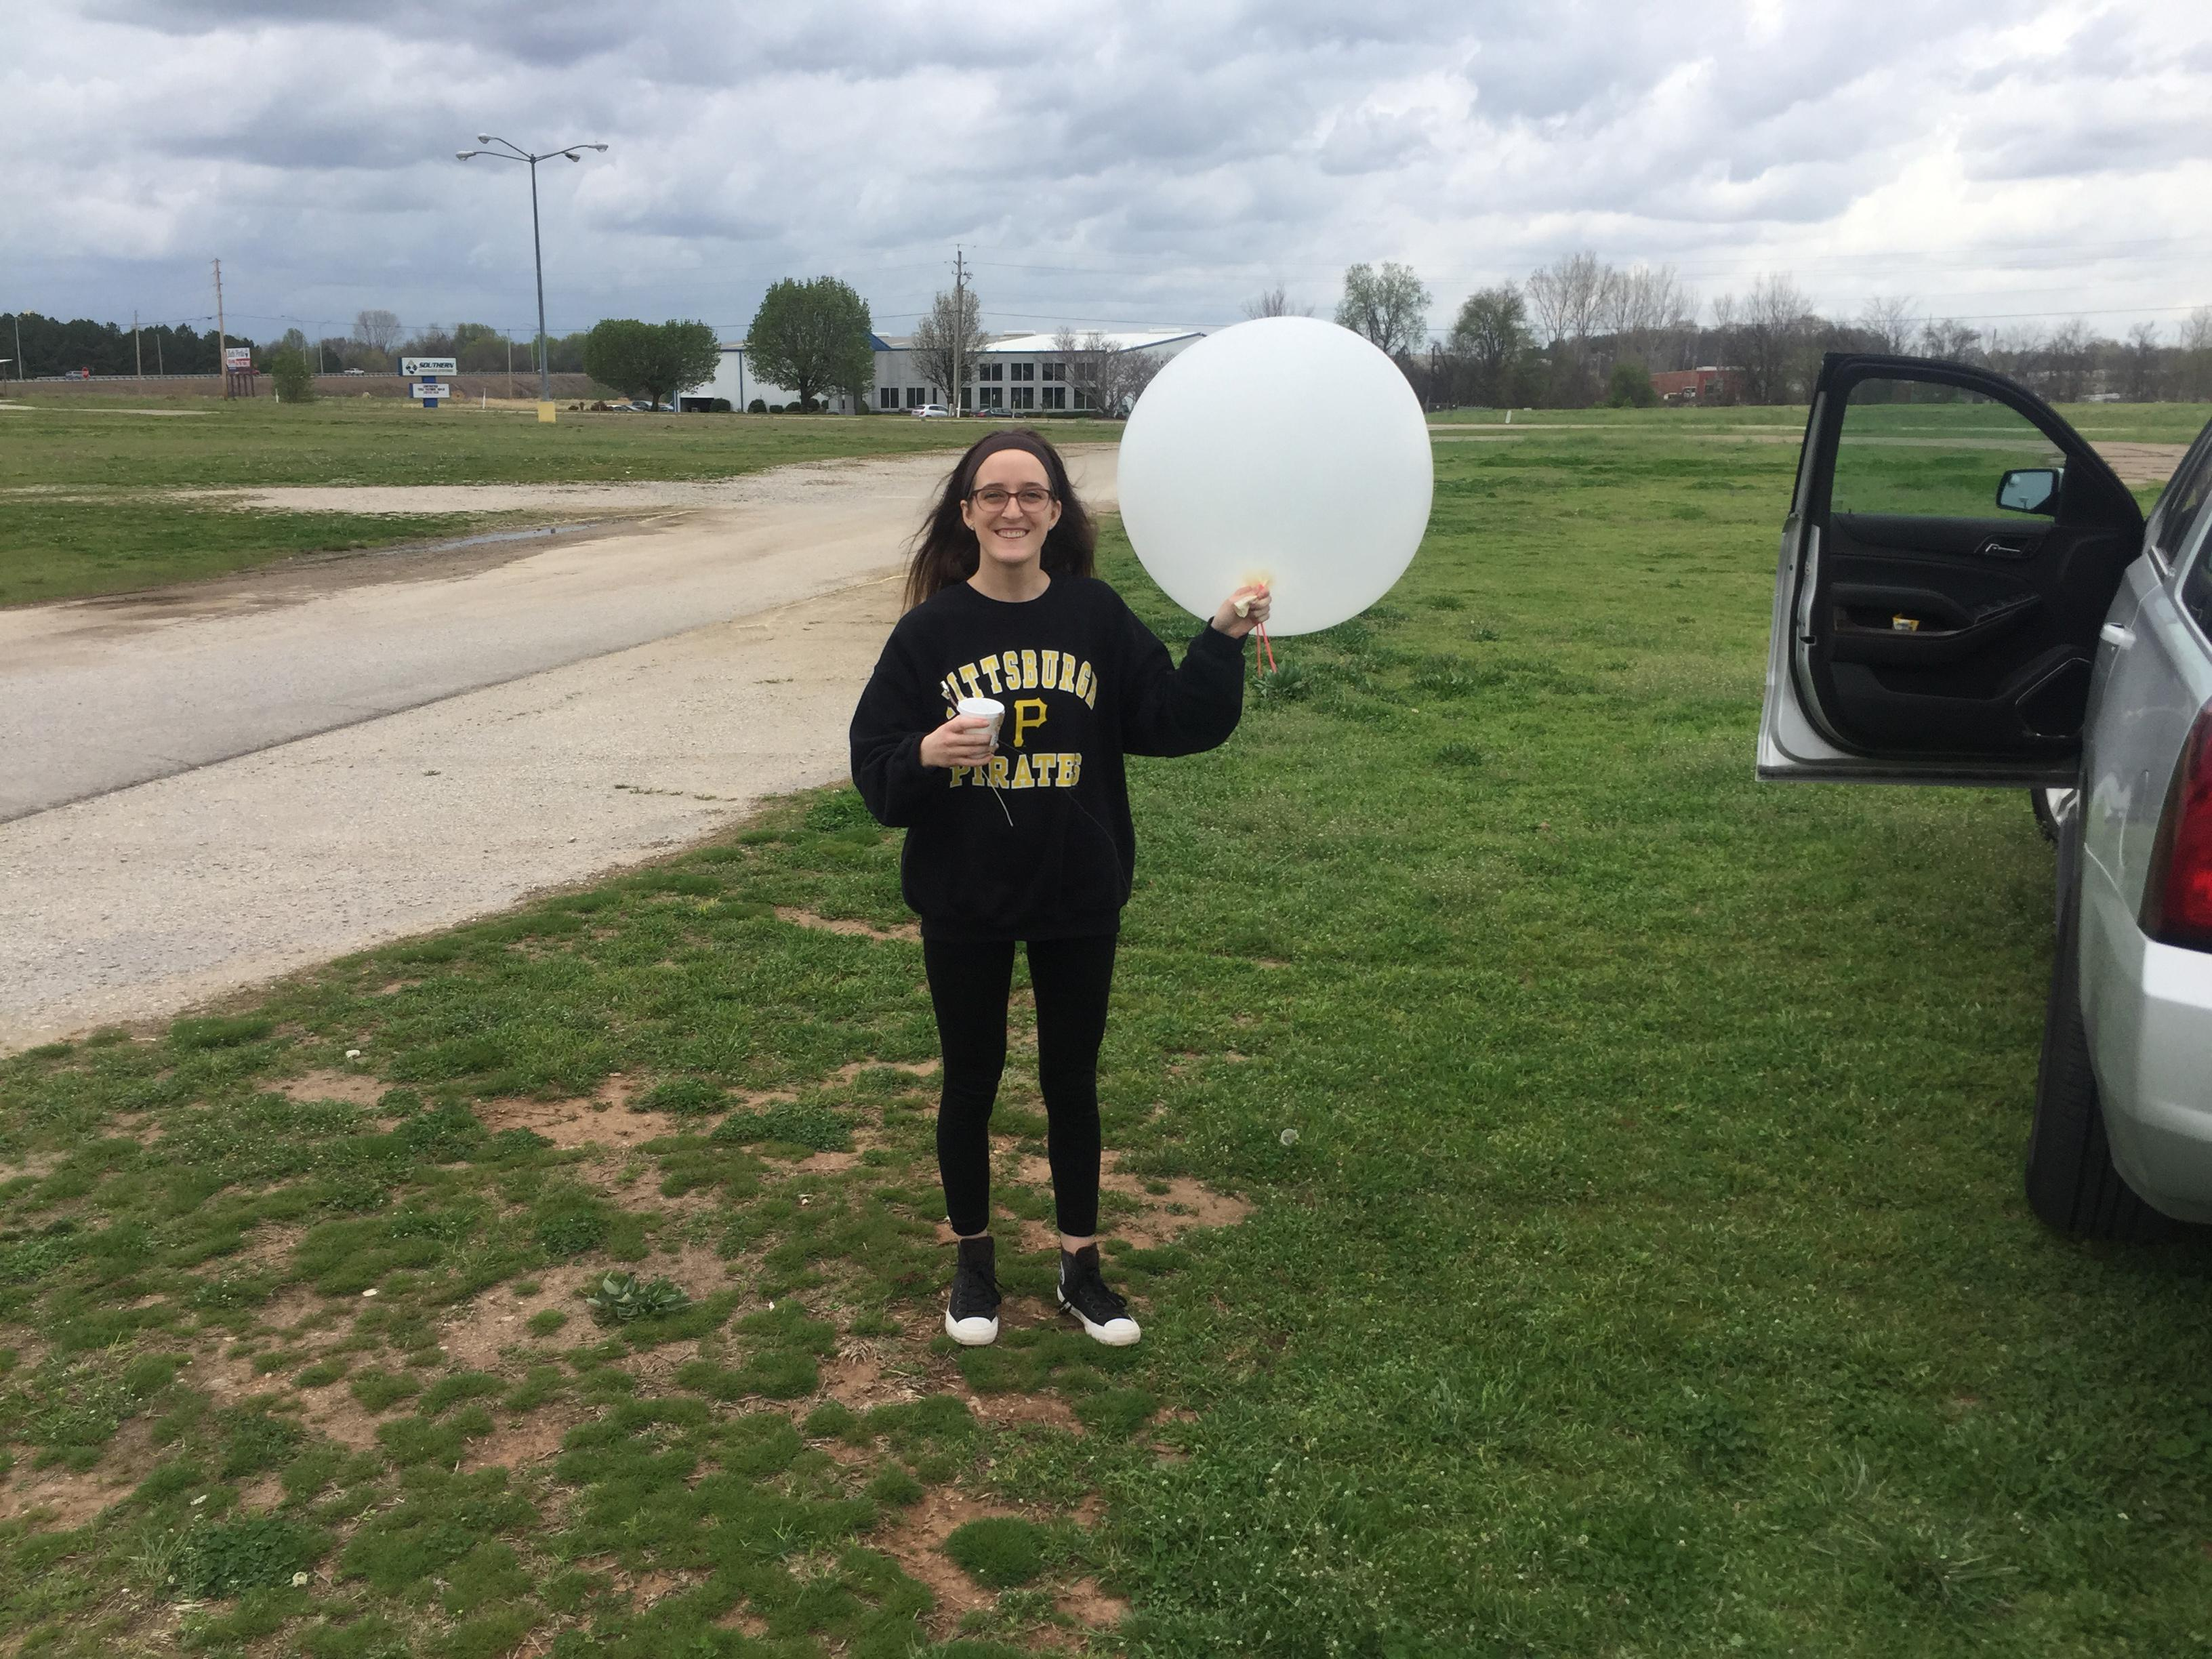 Jessica Bozell studies tornado formation at Purdue University.